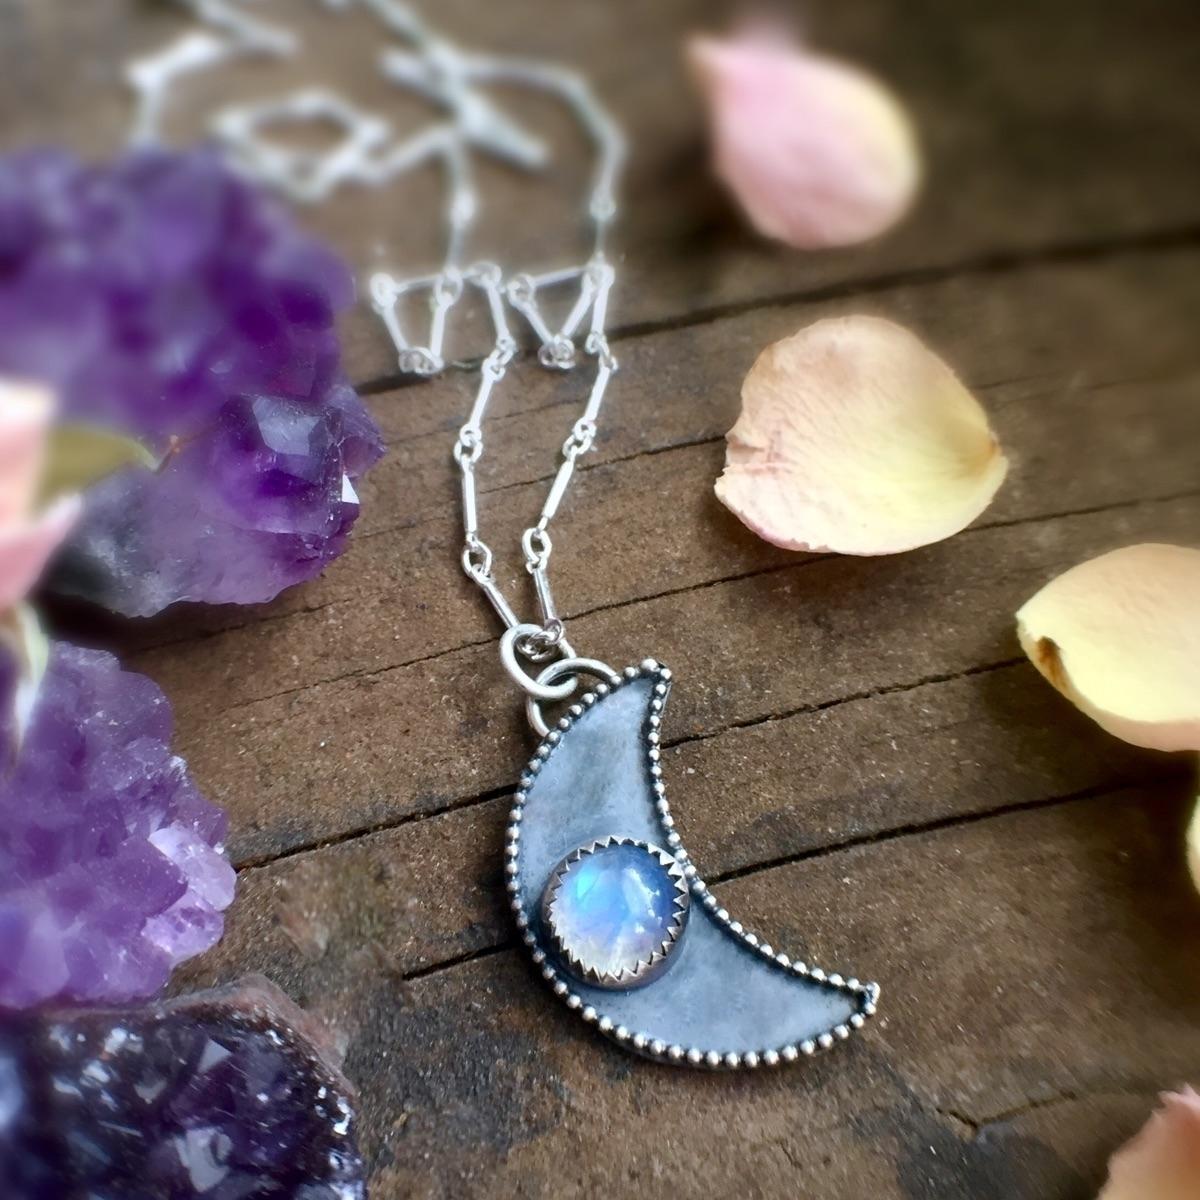 Moon child necklace shop - starseed - starseed_designs | ello